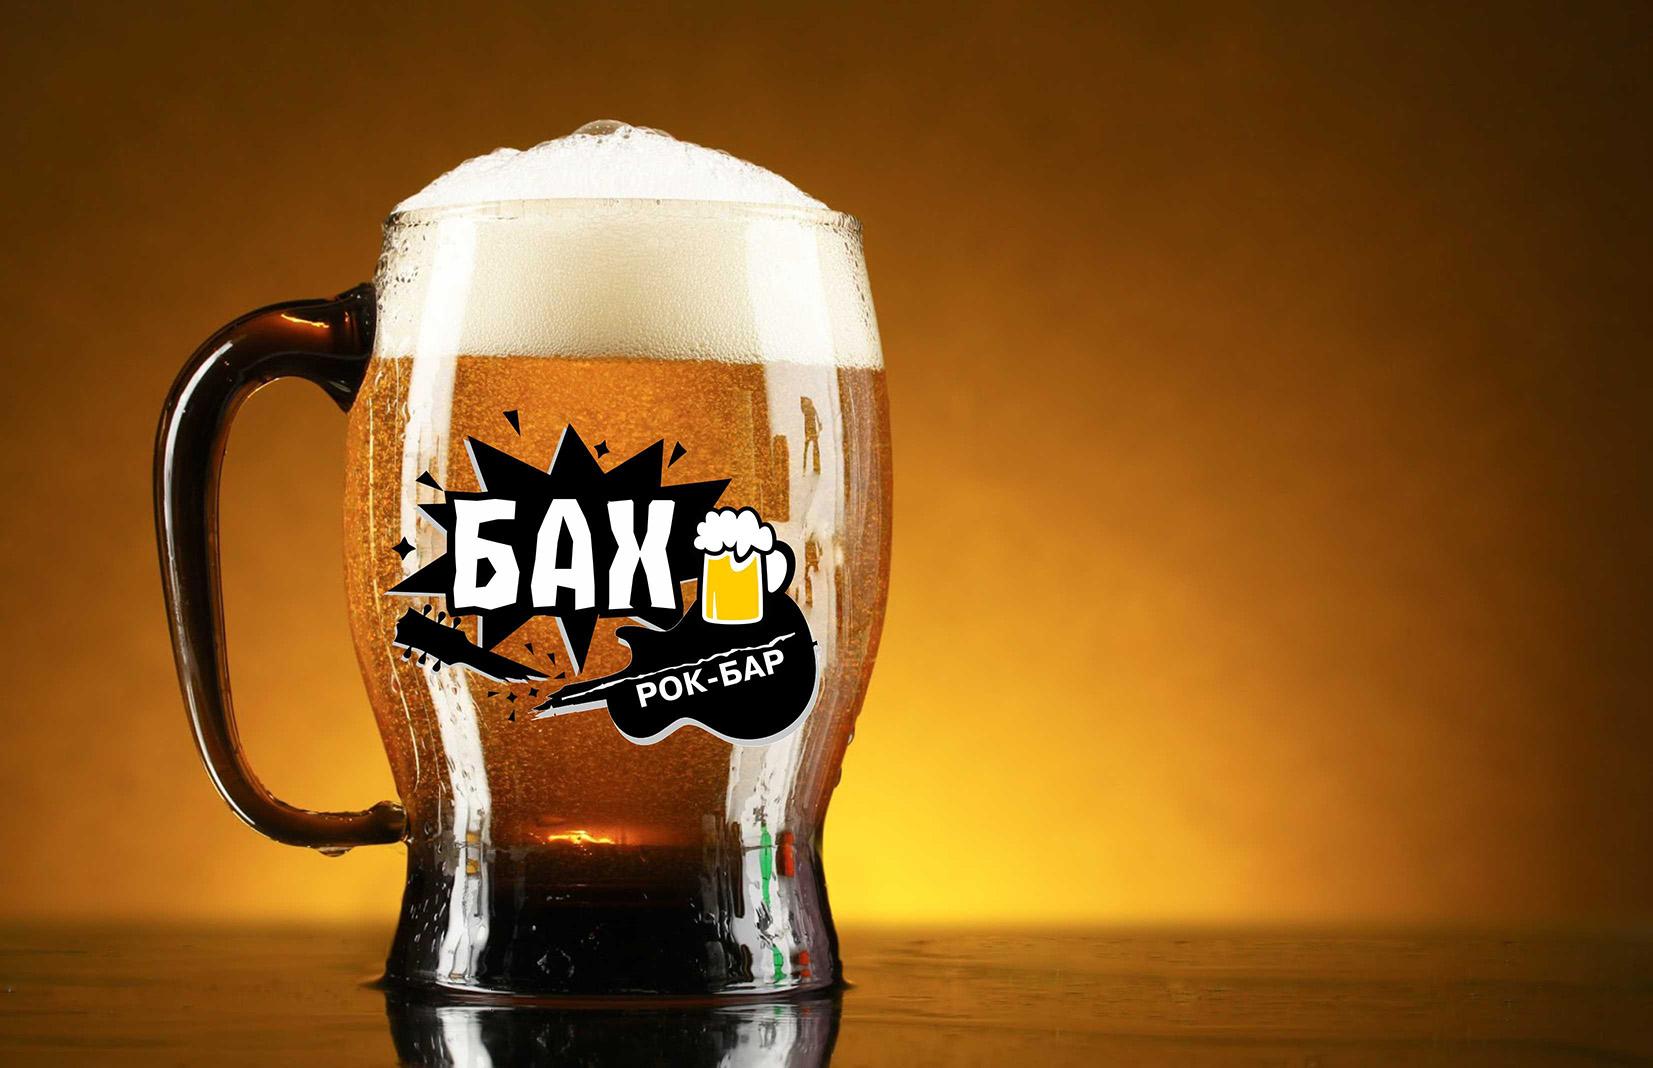 "Разработать логотип и вывеску рок-бару ""Бах"" фото f_13959b16dd464c62.jpg"